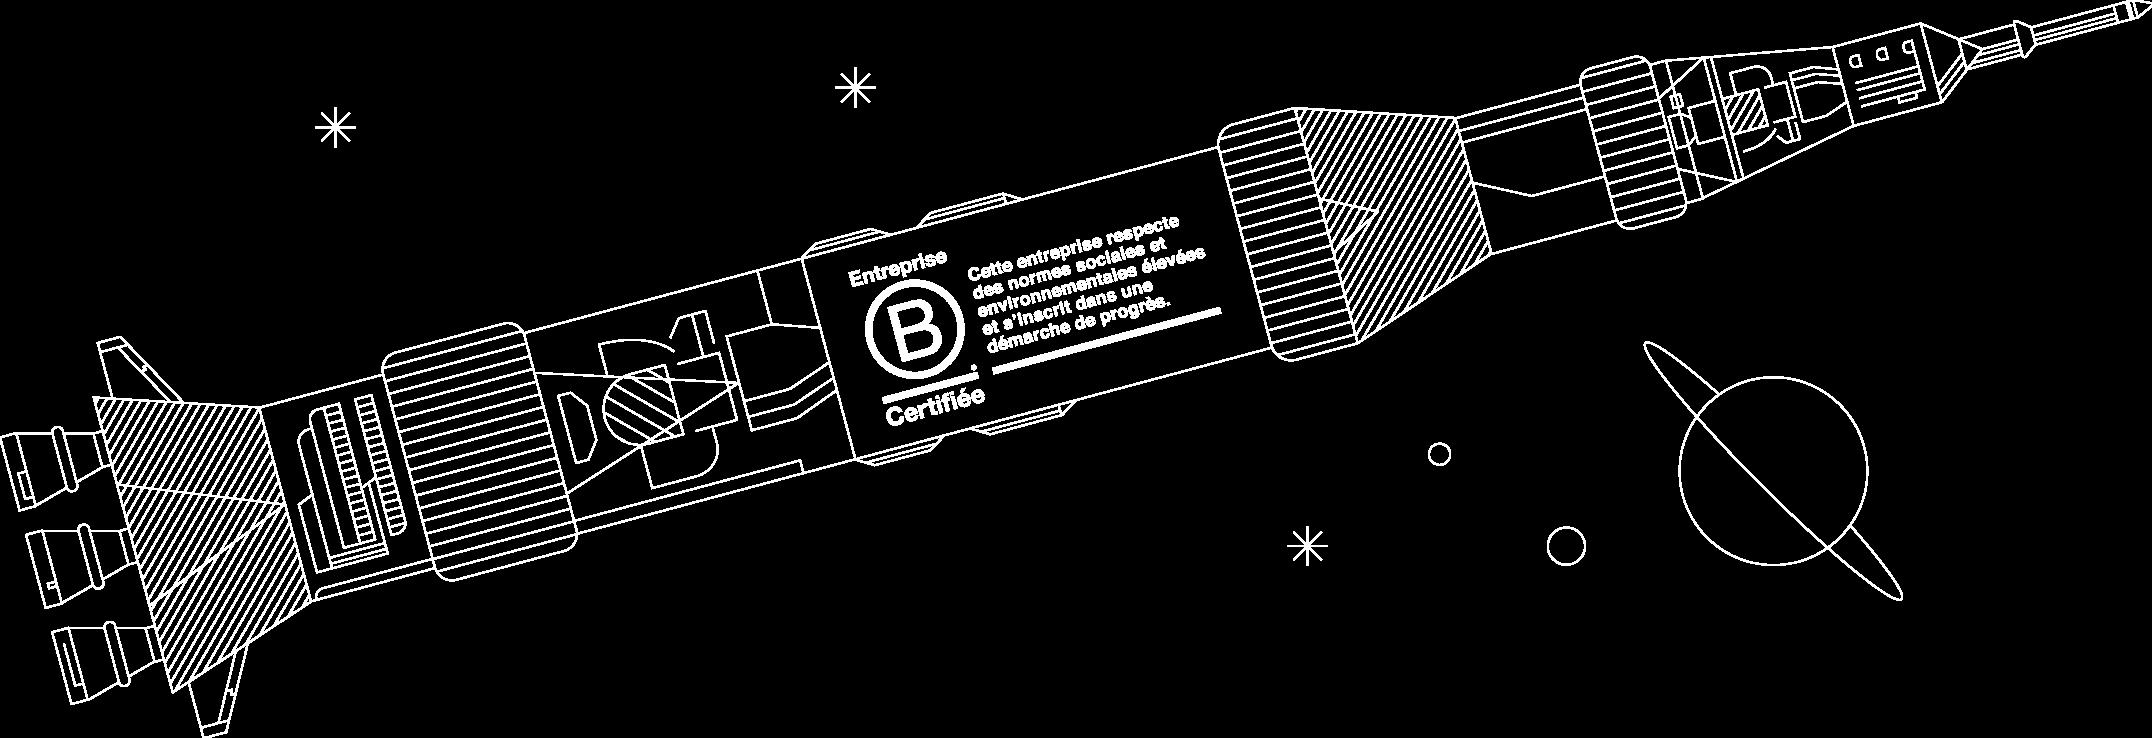 illustration-B-Corp-brightness.png